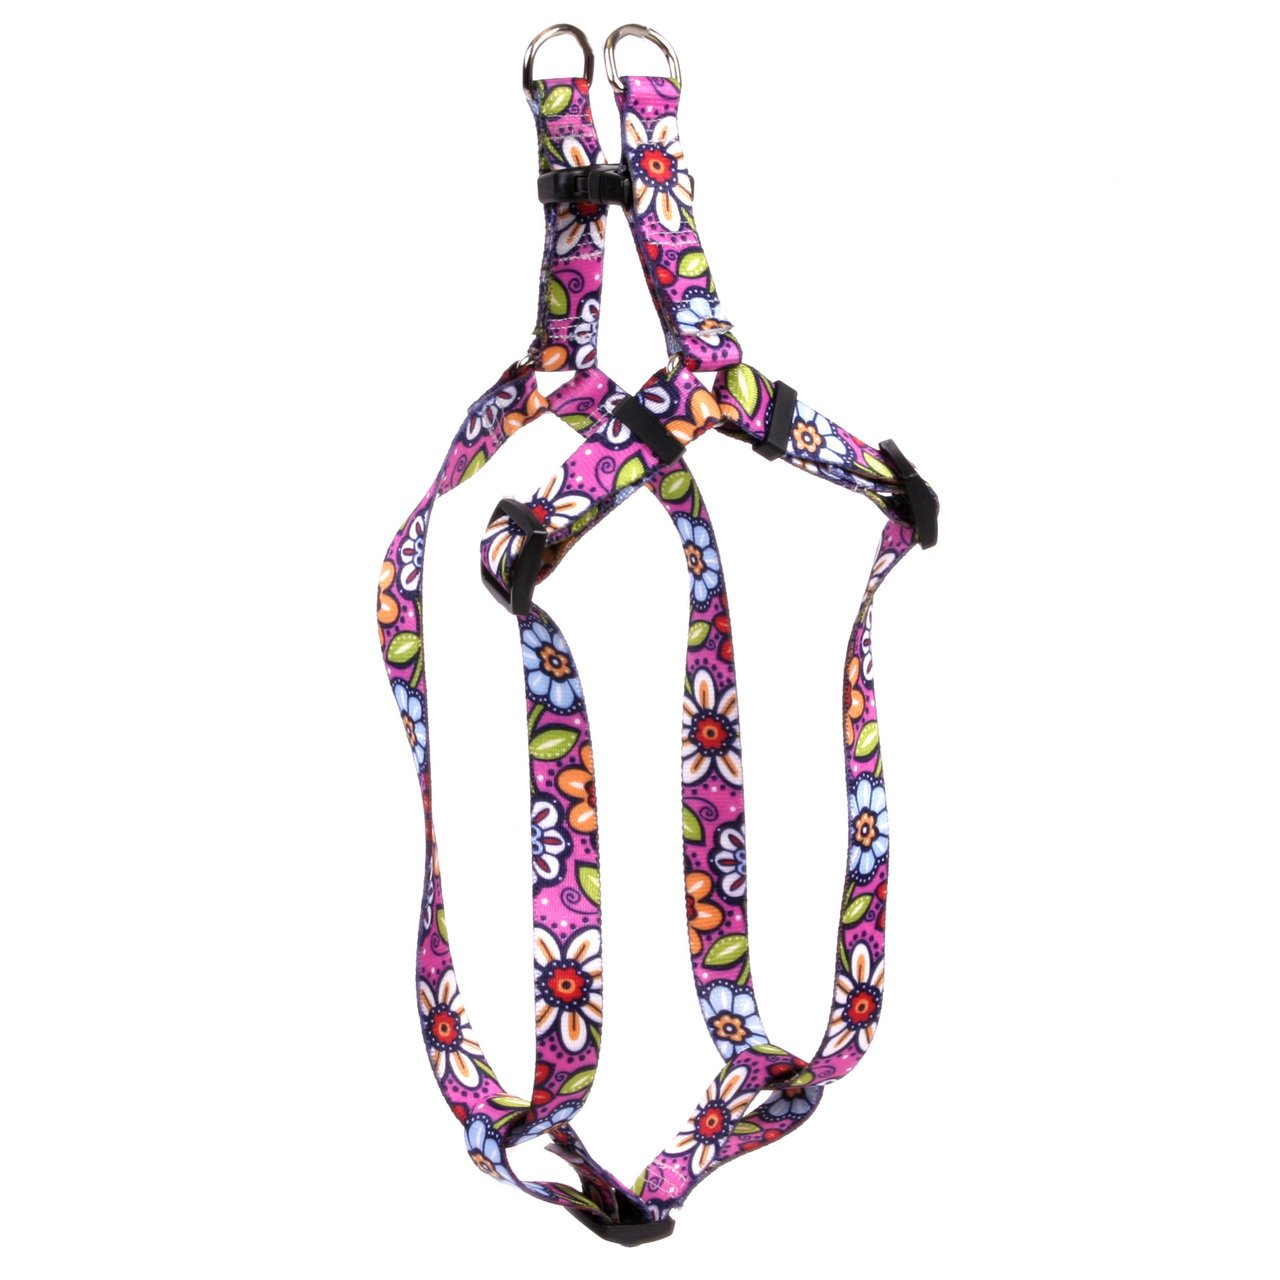 Yellow Dog Design Standard Step-in Harness, Pink Garden, Medium 15'' - 25''